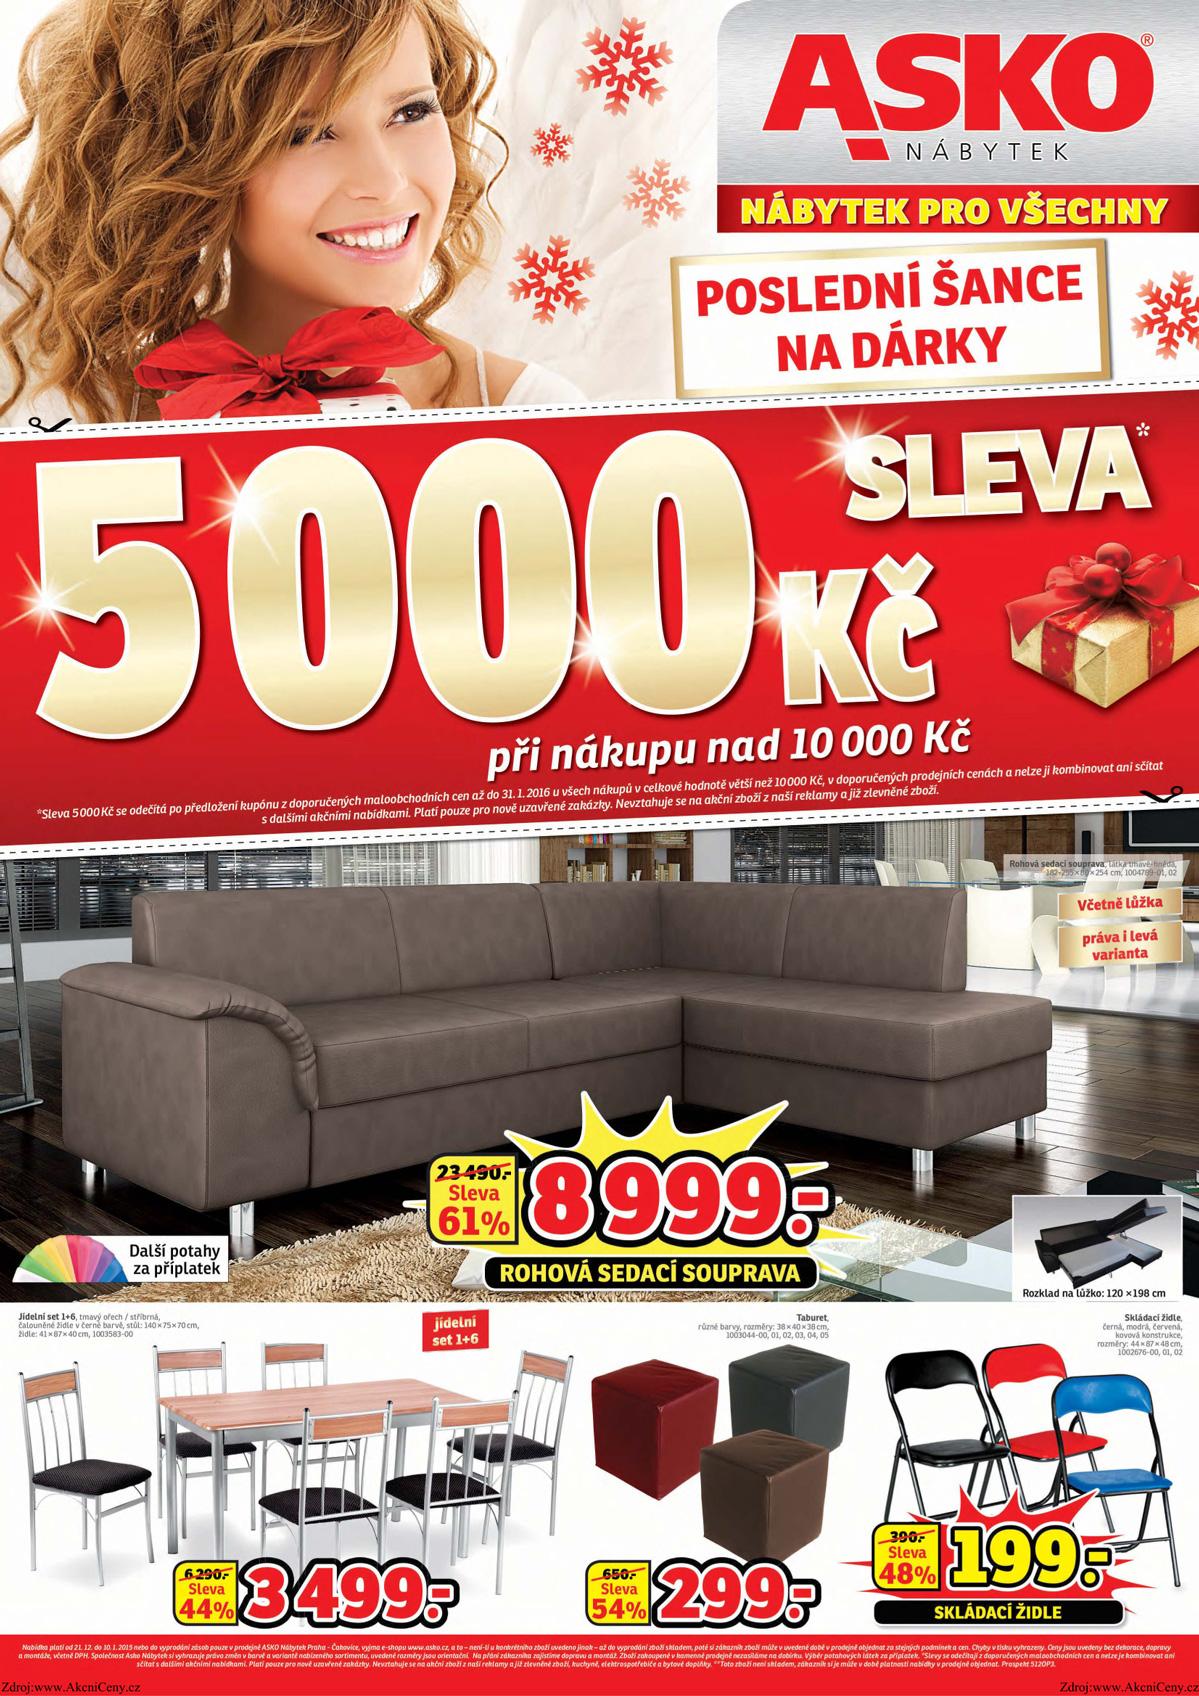 Asko nábytek praha čakovice